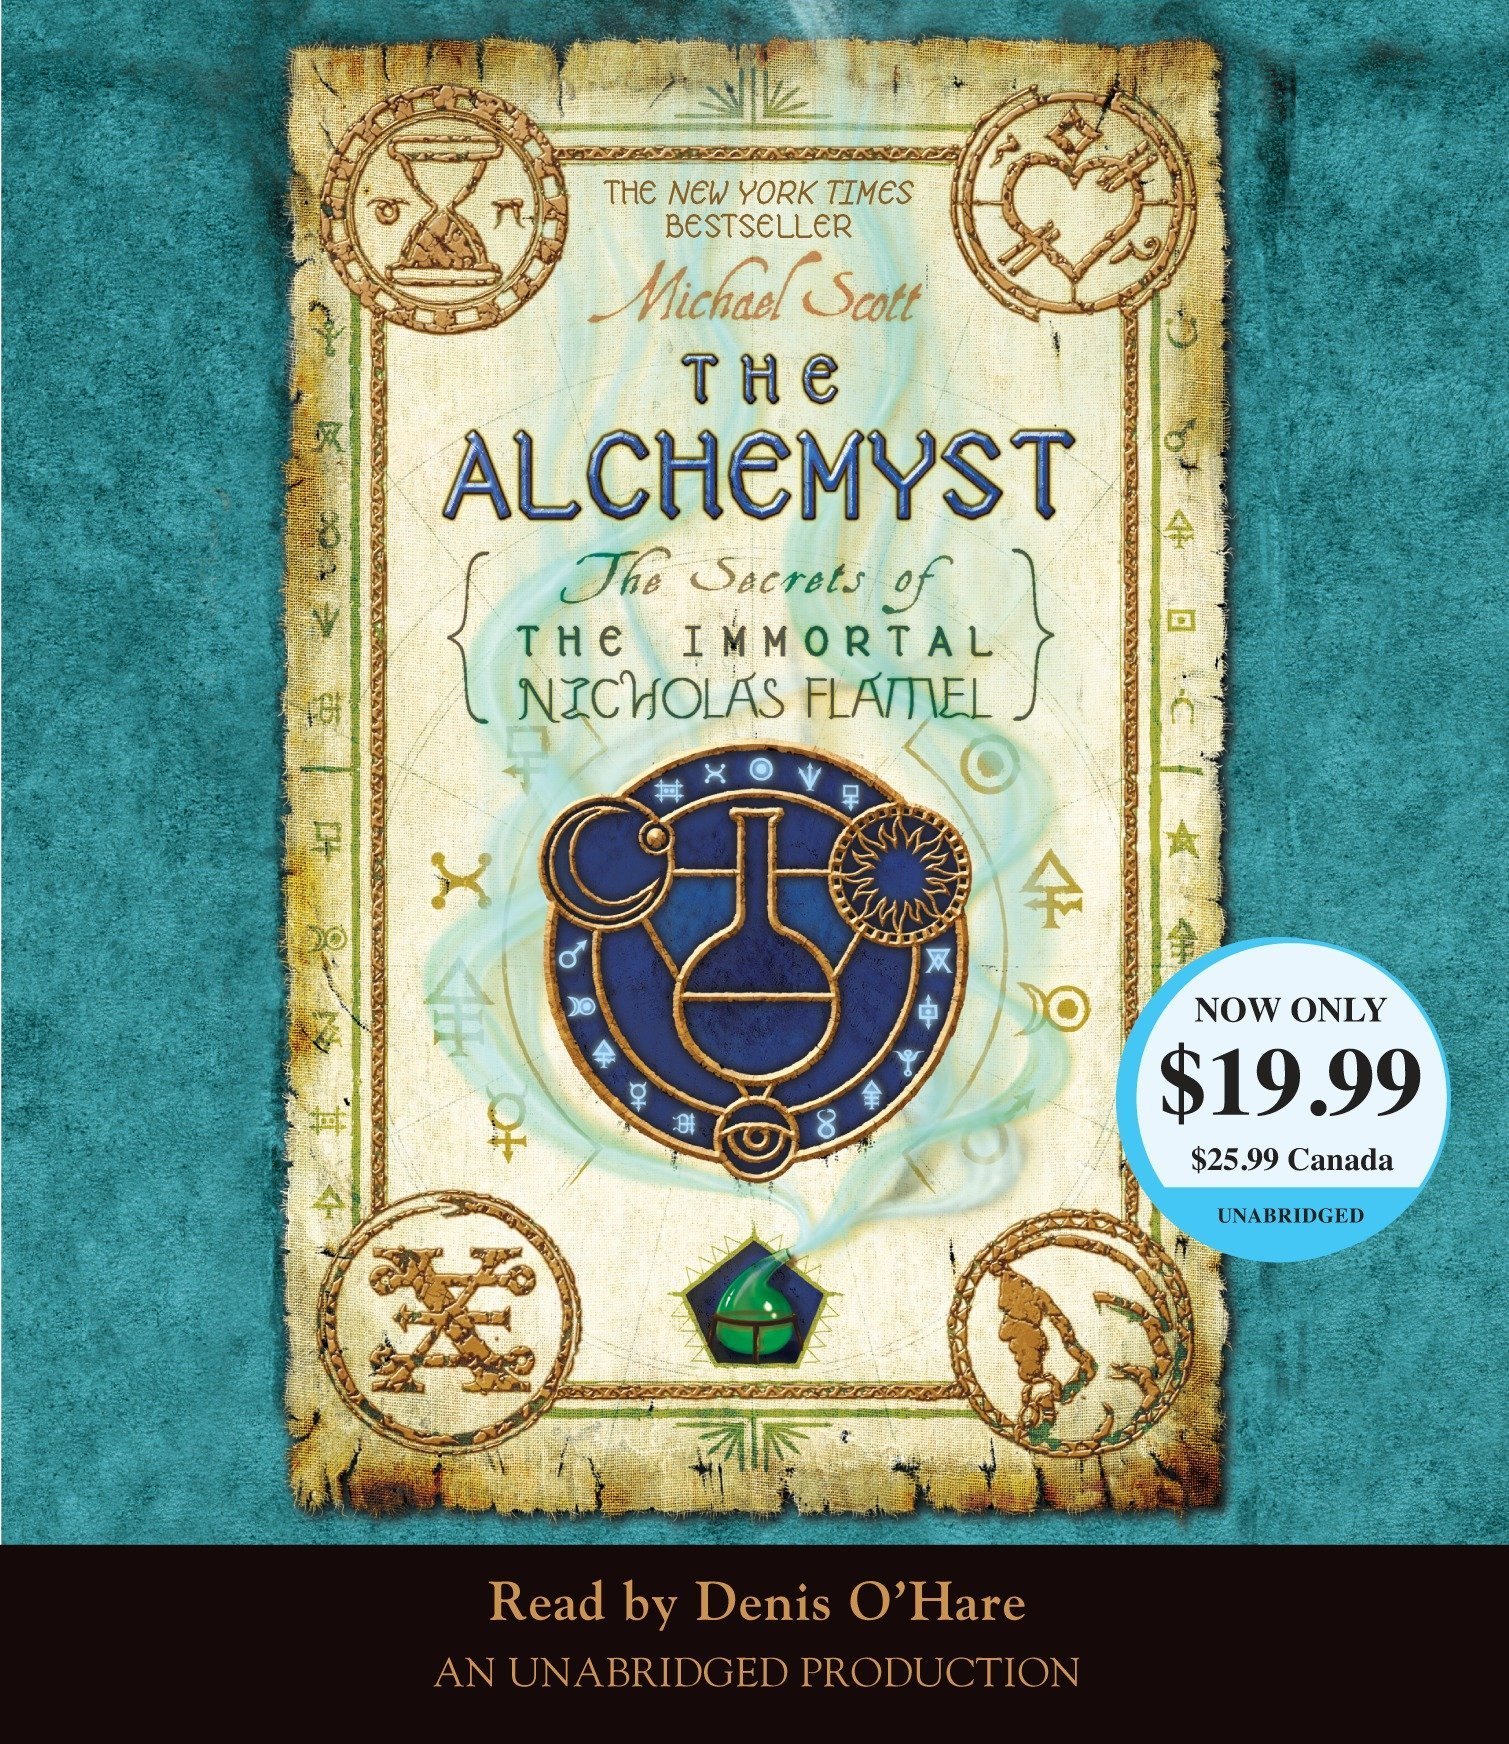 The Alchemyst (The Secrets of the Immortal Nicholas Flamel)